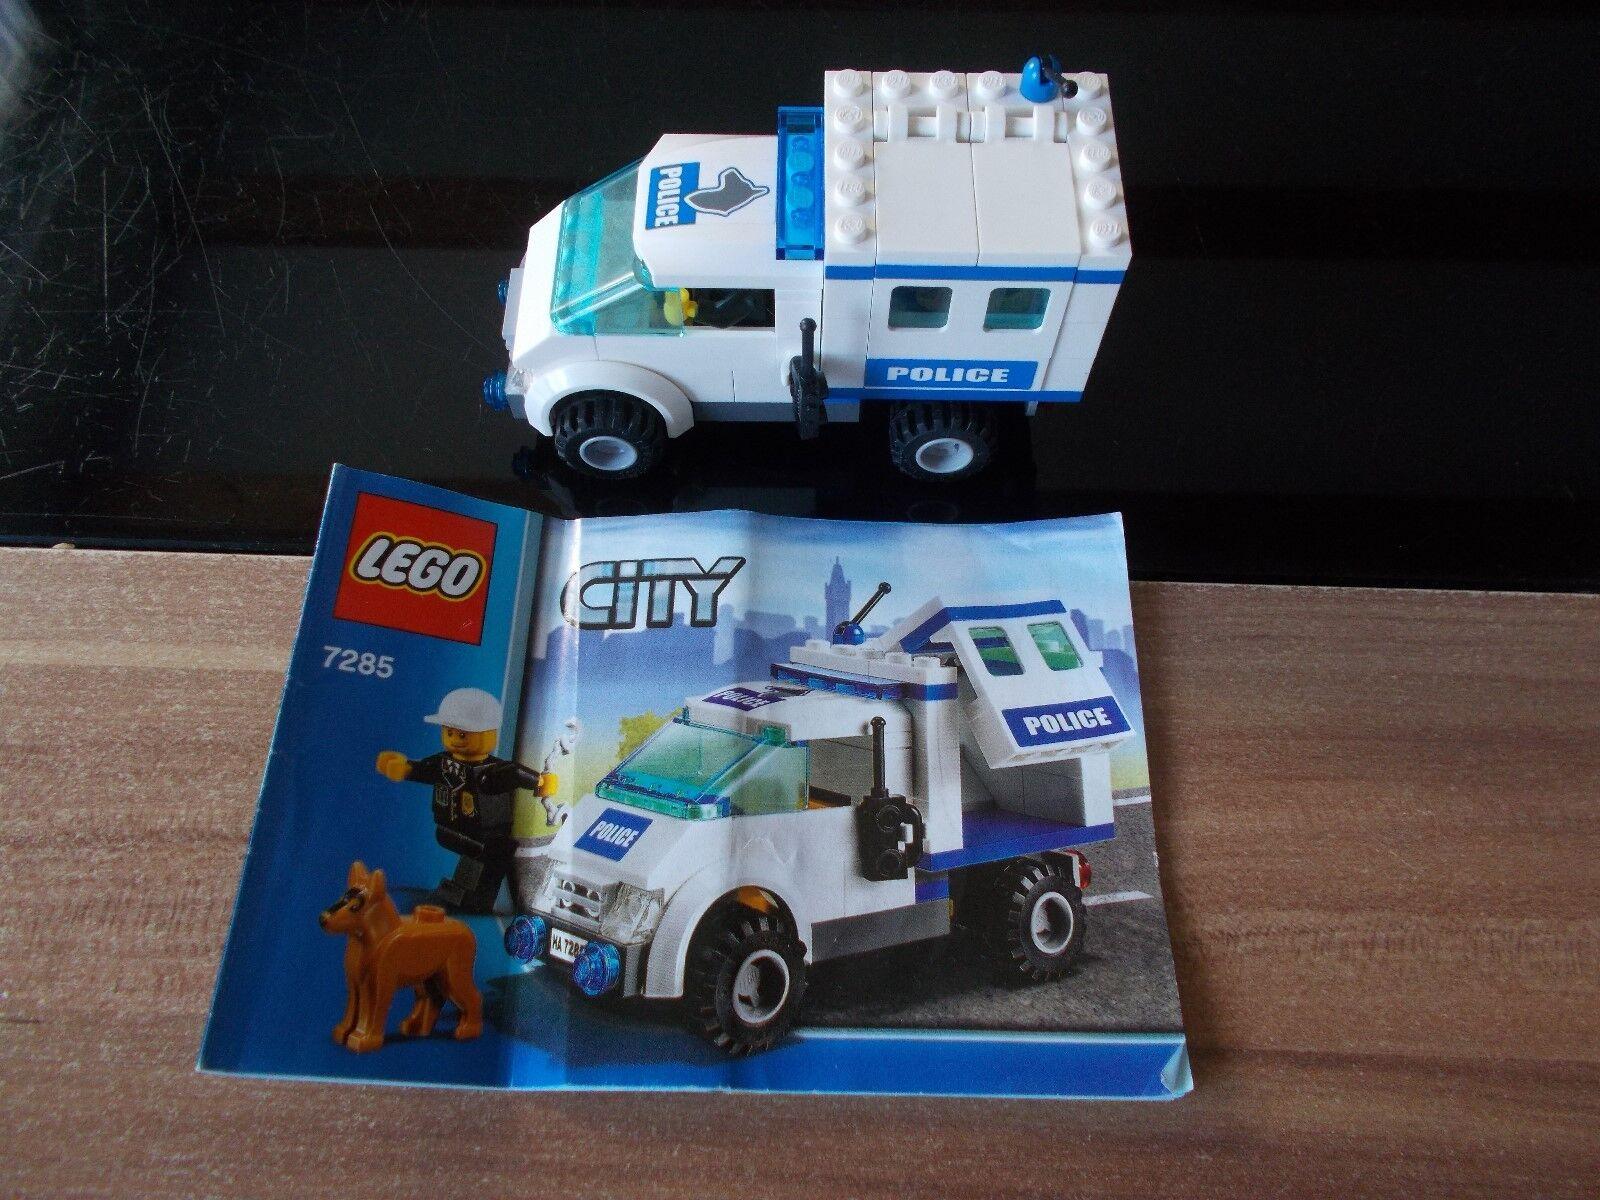 Lego® City - Polizei Konvolut Konvolut Konvolut - 3 Sets - 60043, 4436, 7285 mit Bauanleitung (BA) 98f61d